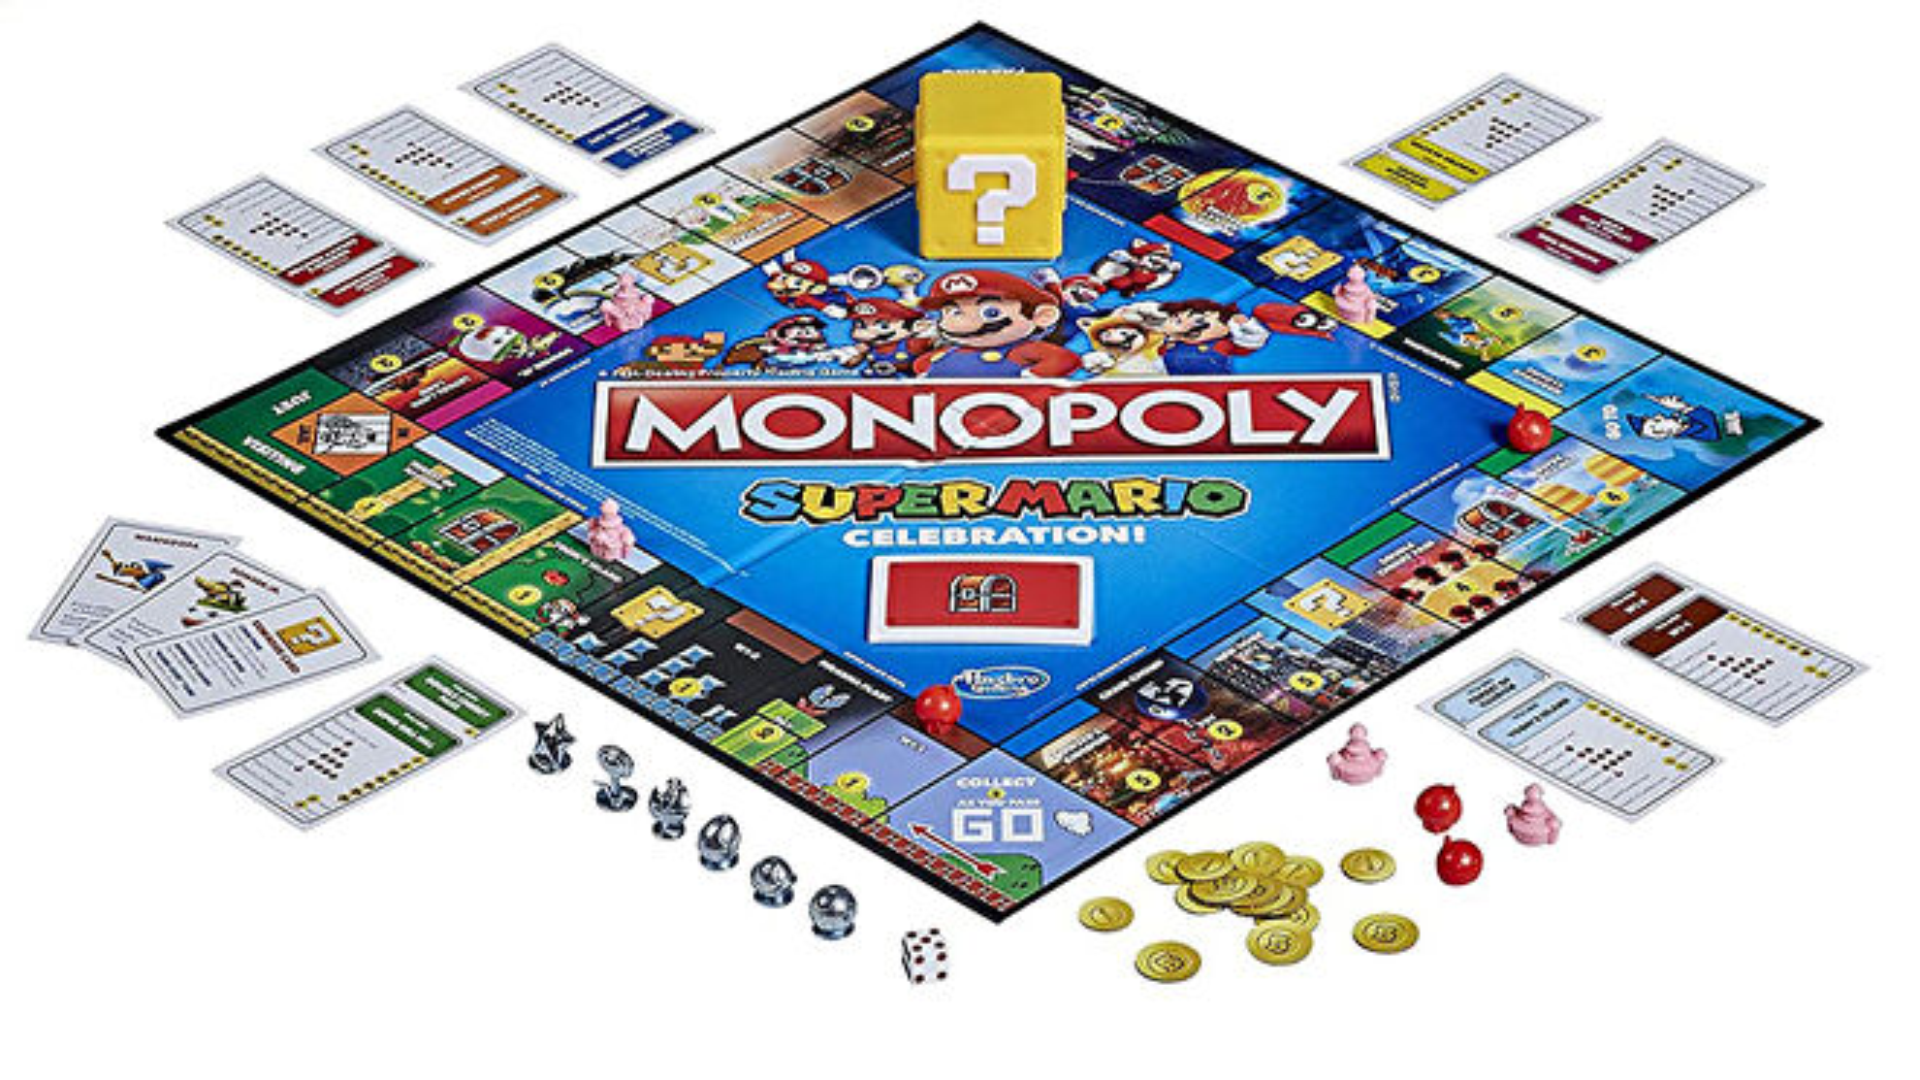 Monopoly: Super Mario Celebration Edition layout